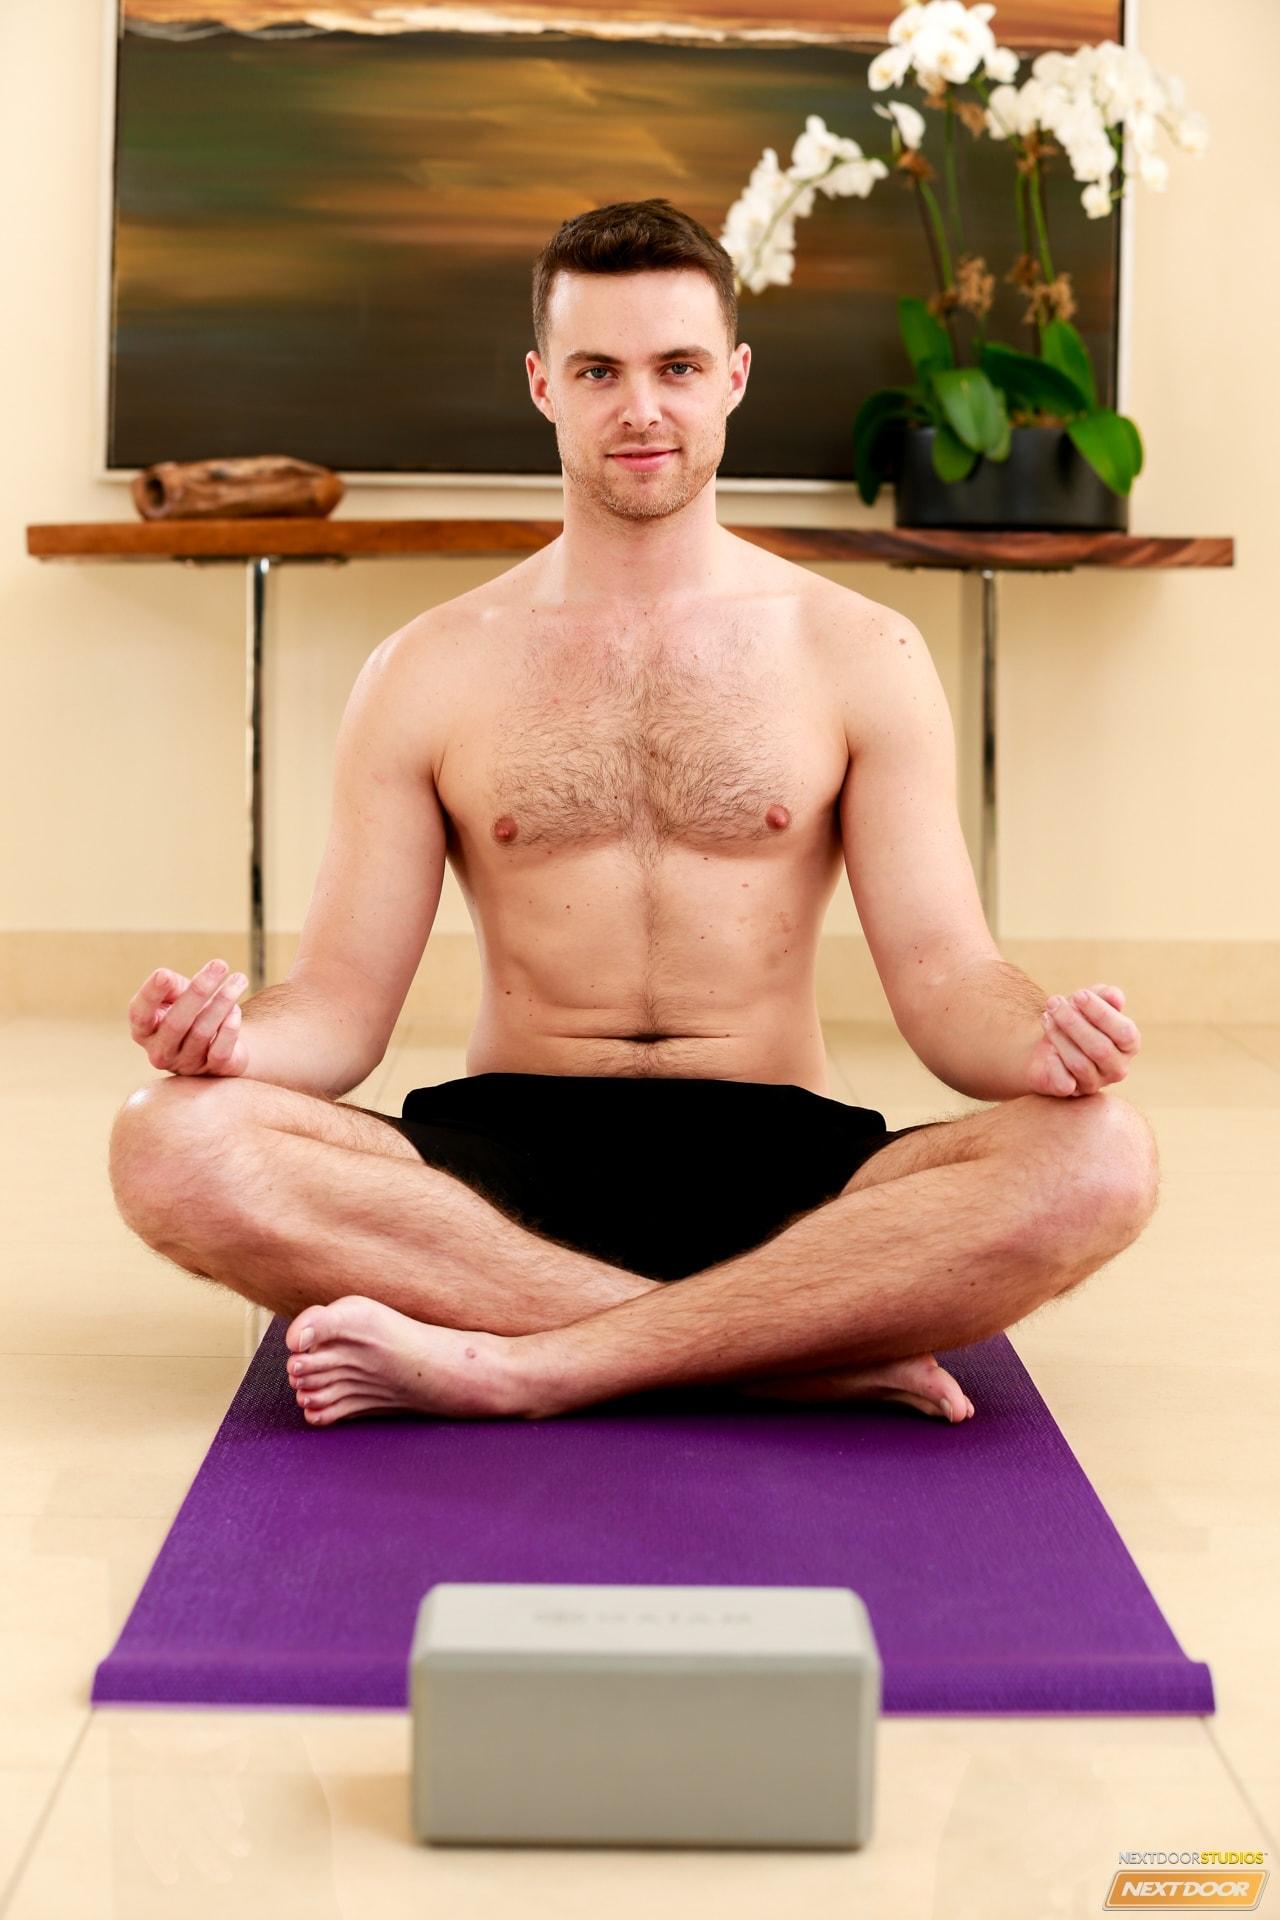 Next Door Studios 'Yoga Stretched' starring Brandon Moore (Photo 6)